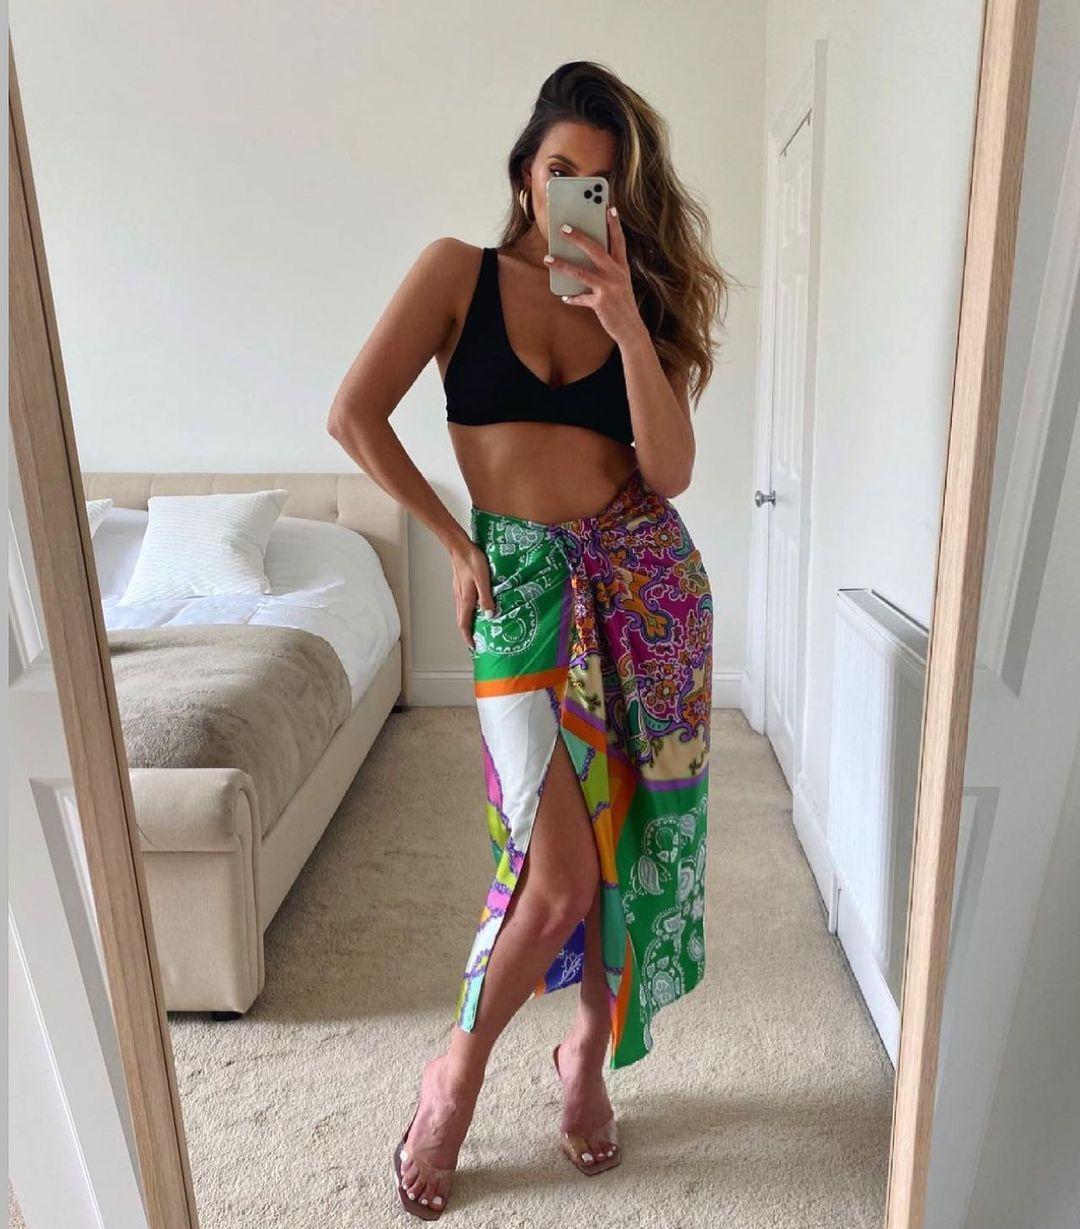 skirt with printed bow de Zara sur zara.style.daily